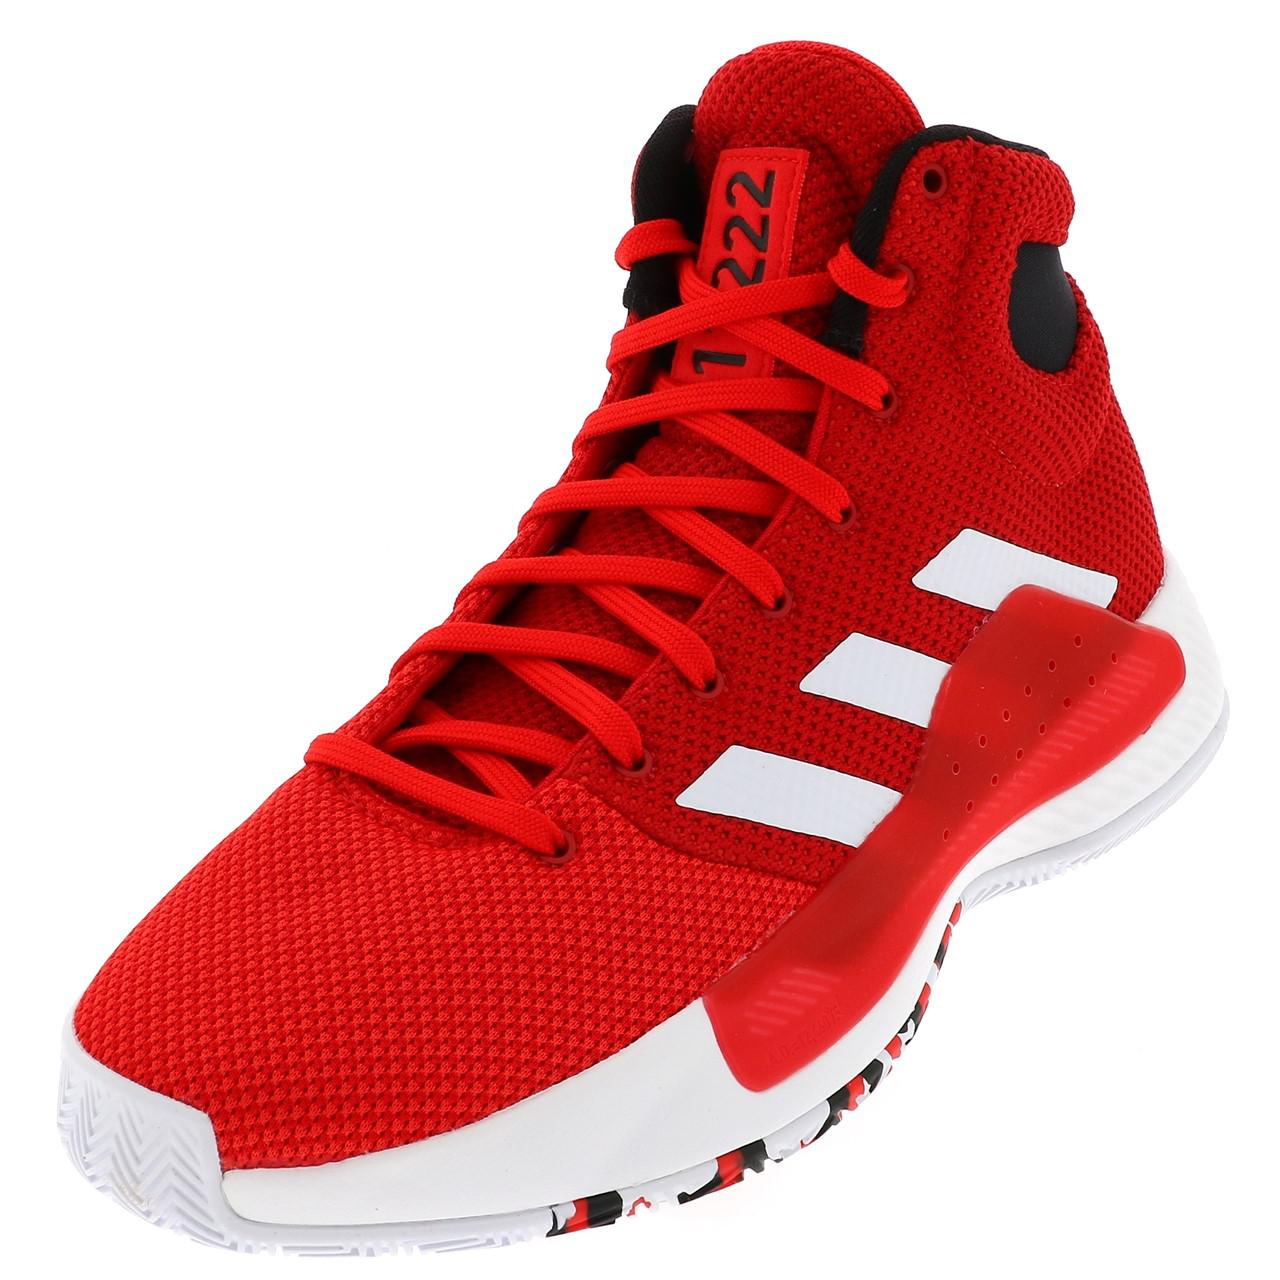 Chaussures-basket-Adidas-Pro-bounce-madness-basket-Rouge-55000-Neuf